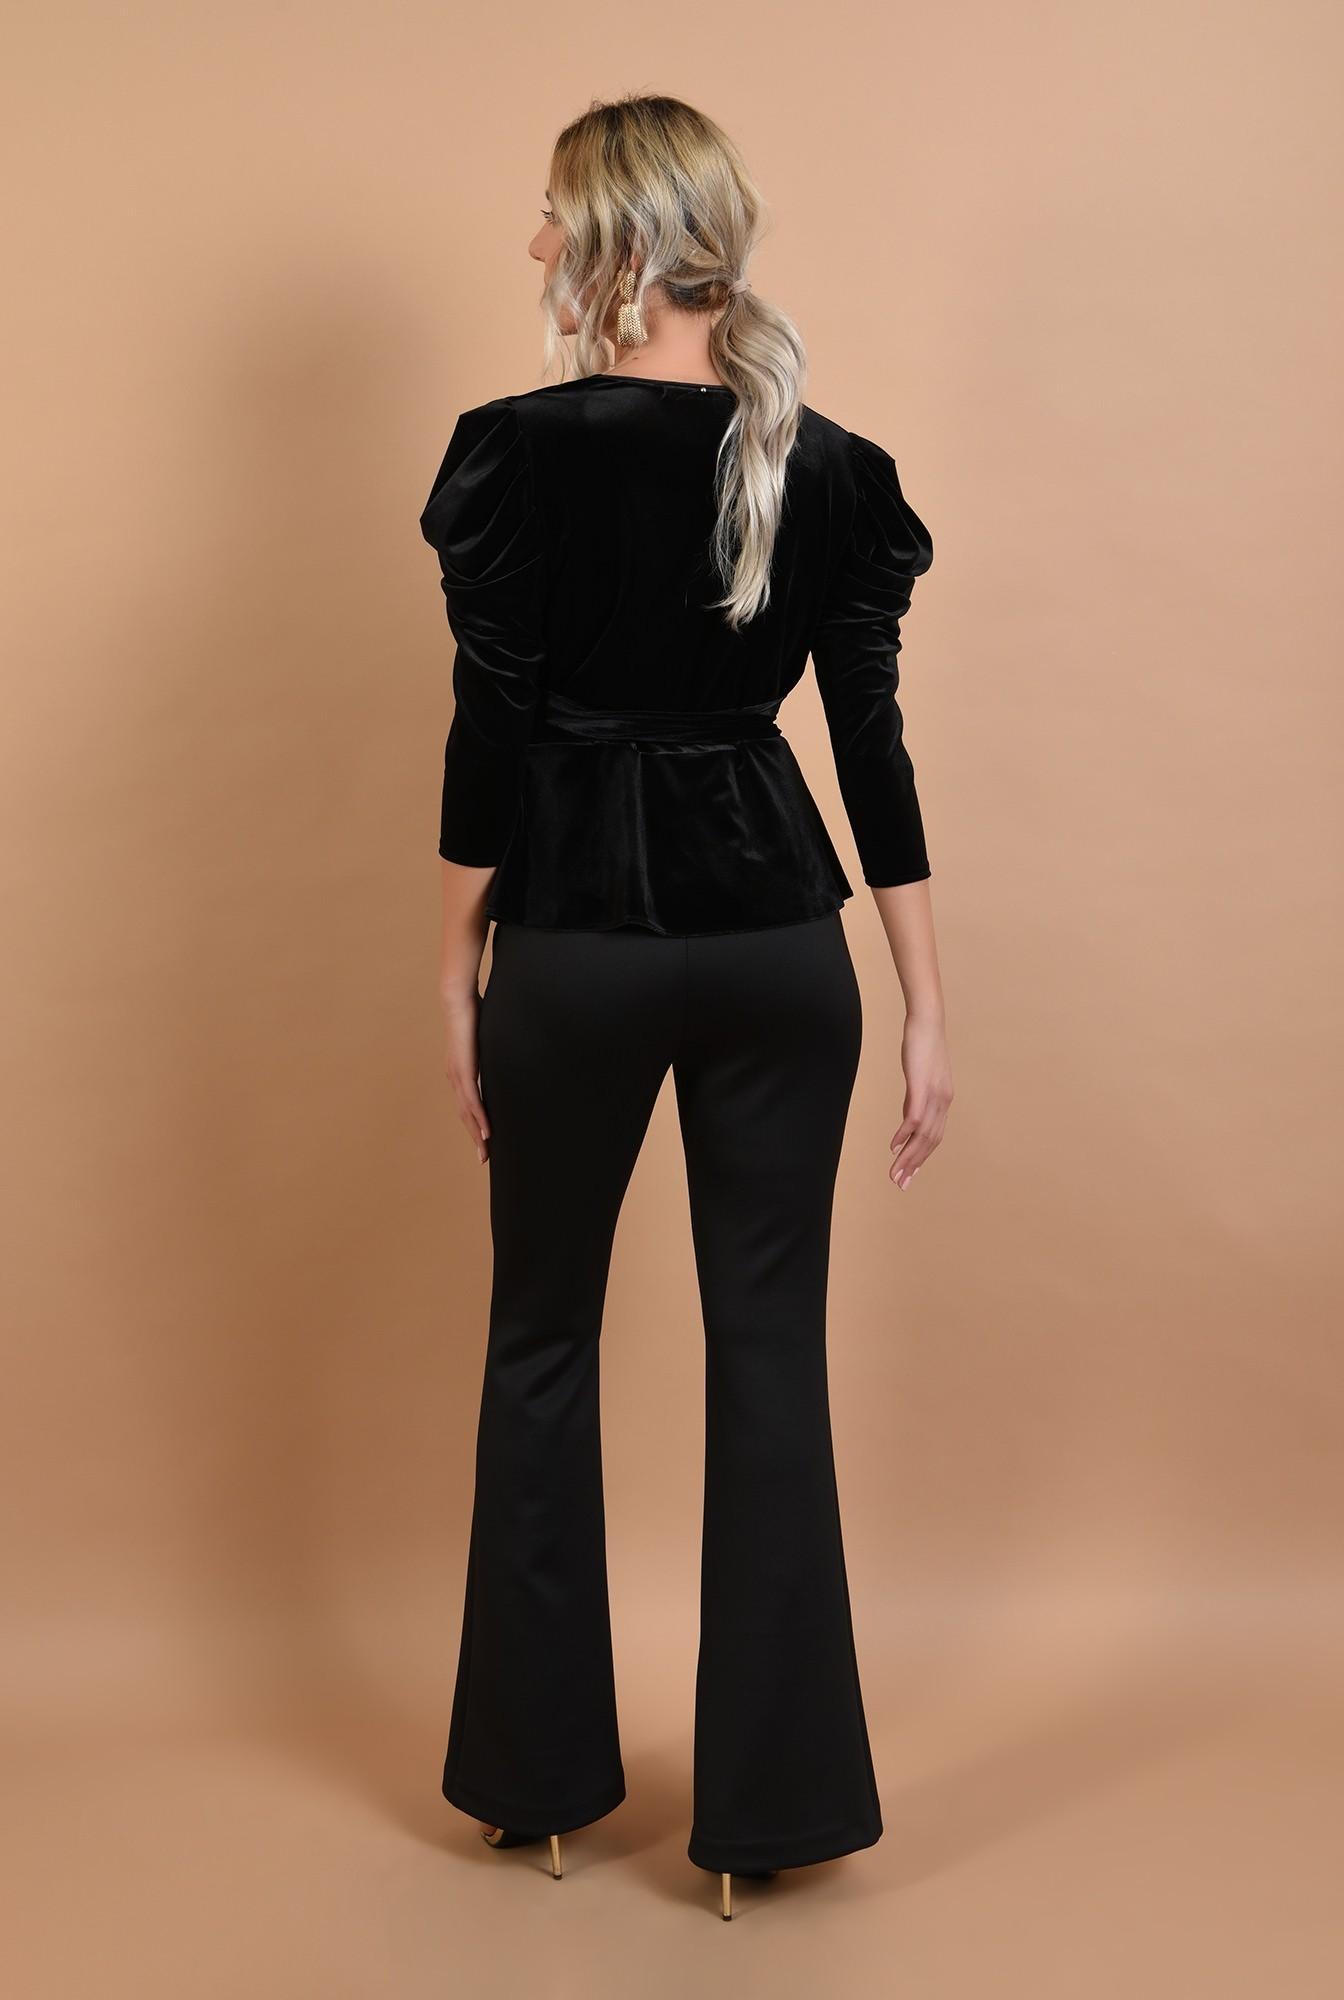 1 - bluza eleganta, cu maneci lungi, cordon la talie, decolteu anchior